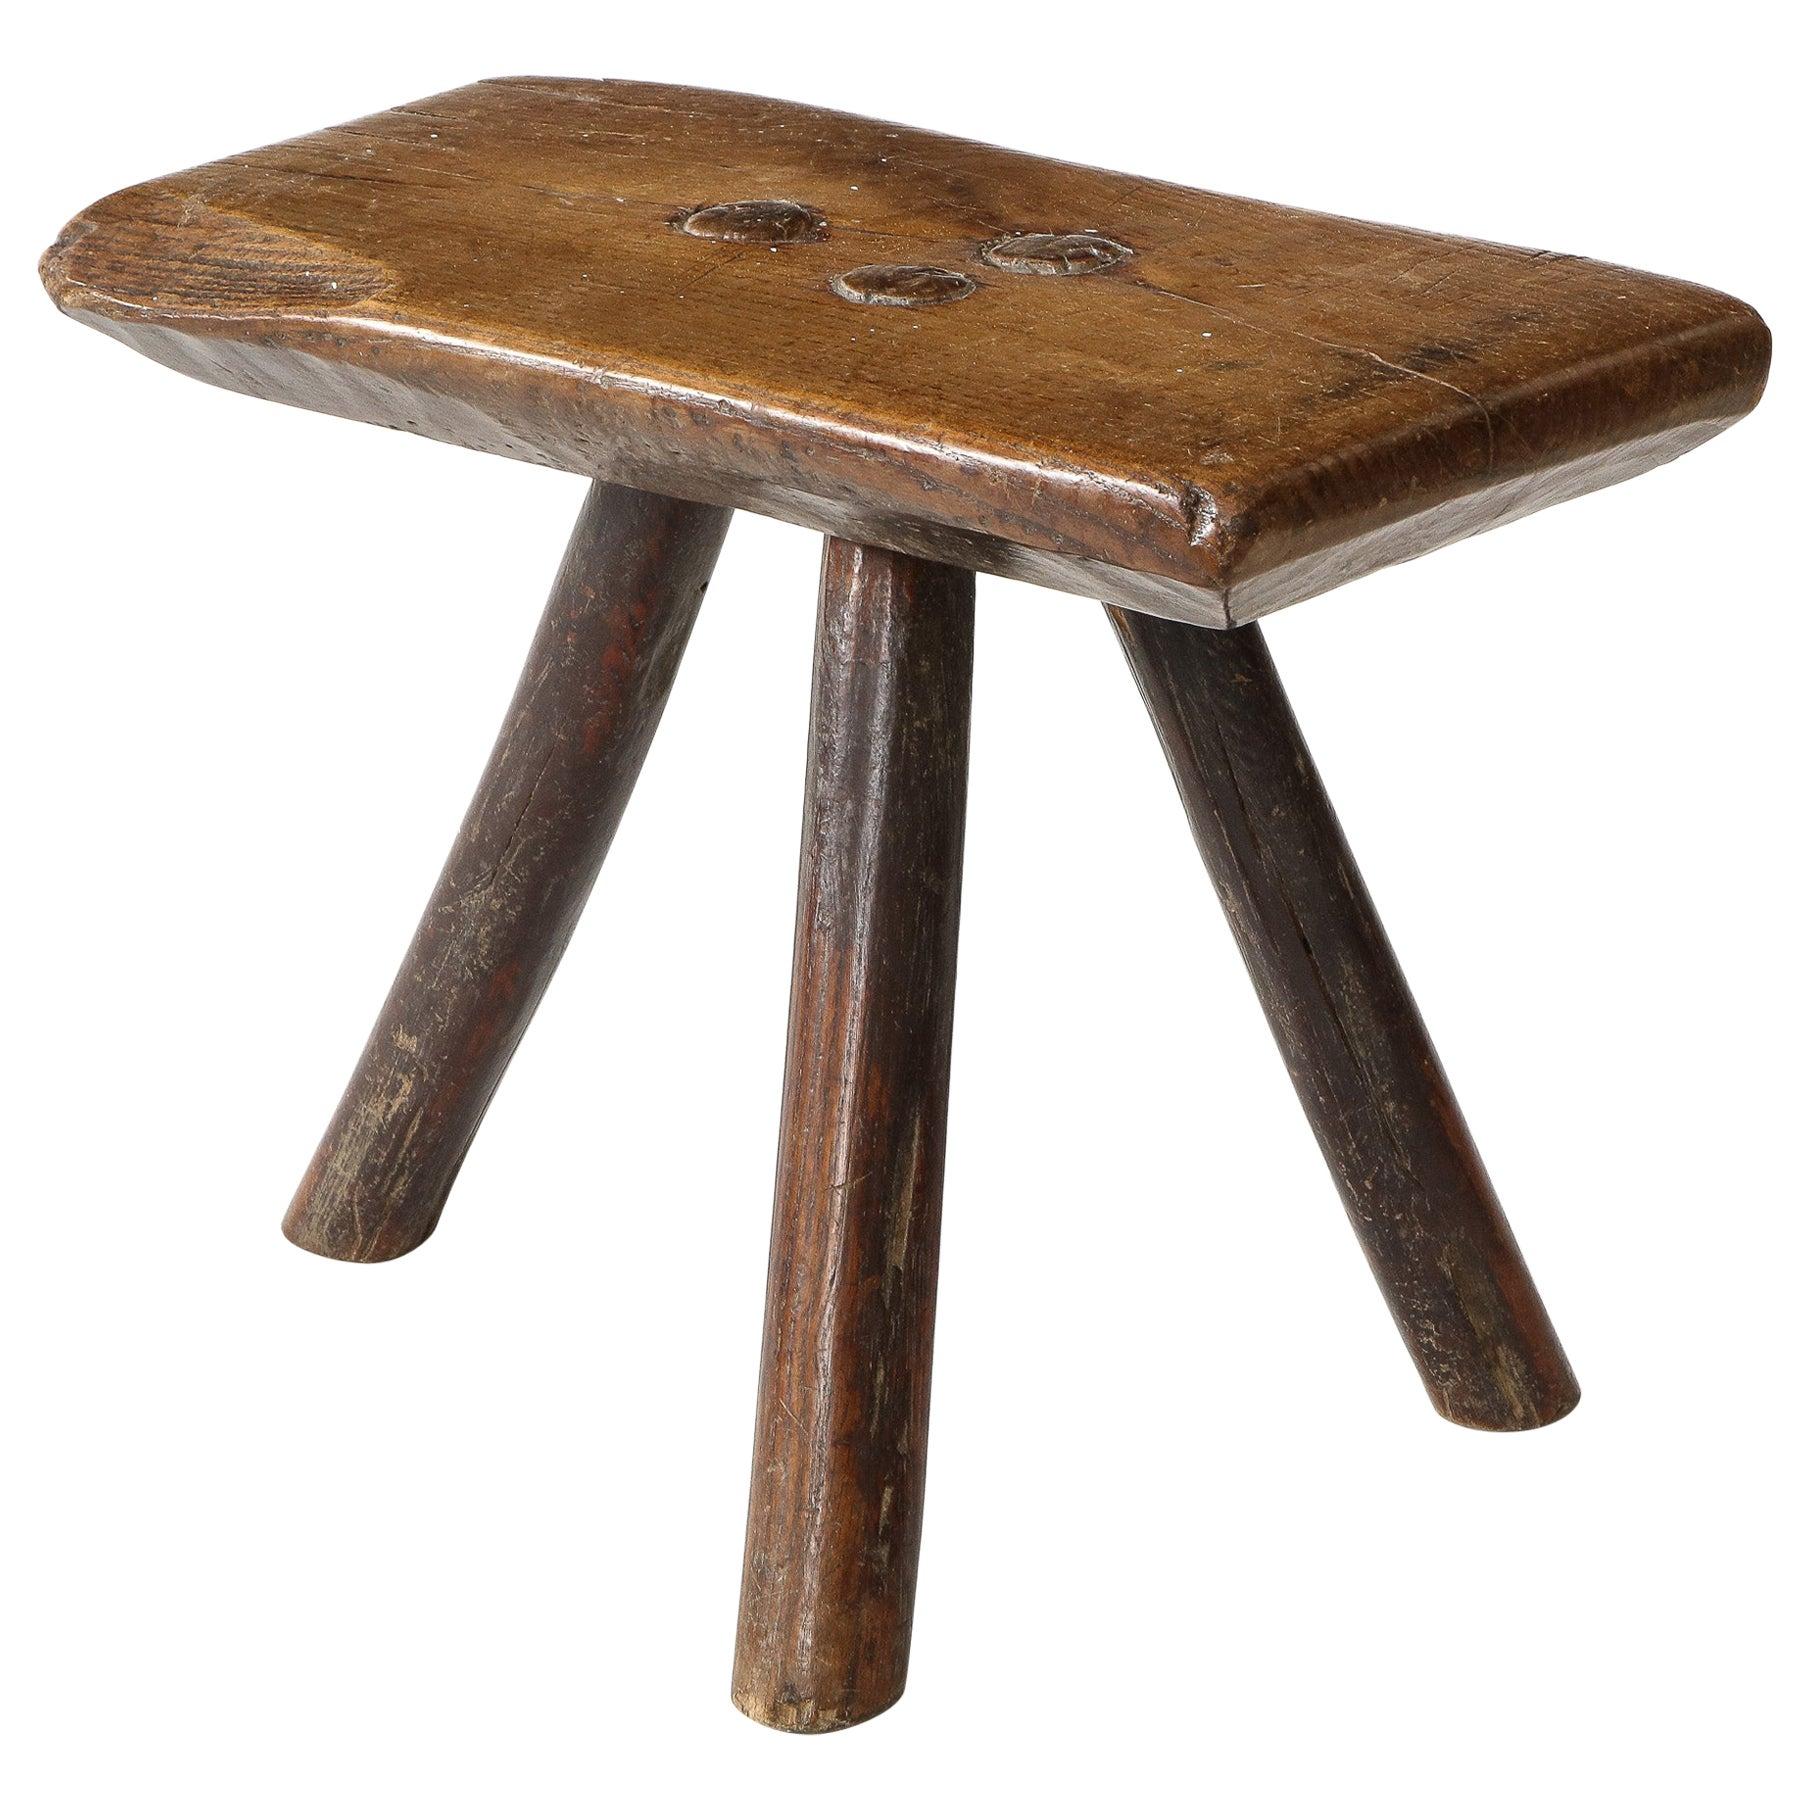 Rustic Wood Splayed Leg Tripodal Low Stool